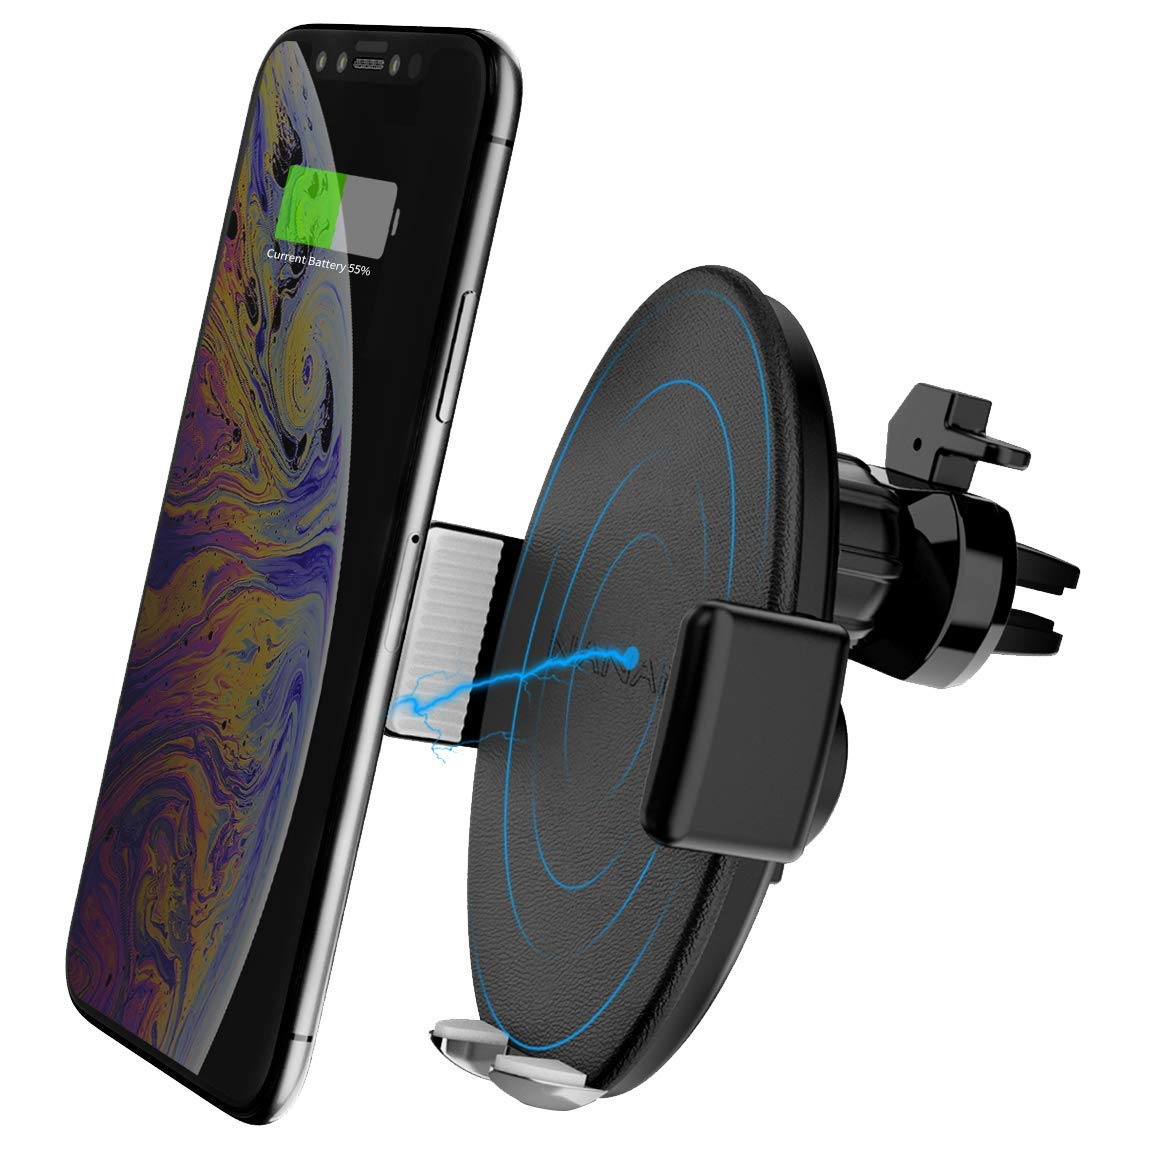 MTB Fahrrad Bike Lenker Handy Halterung abnehmbar für iPhone XR XS Samsung S10